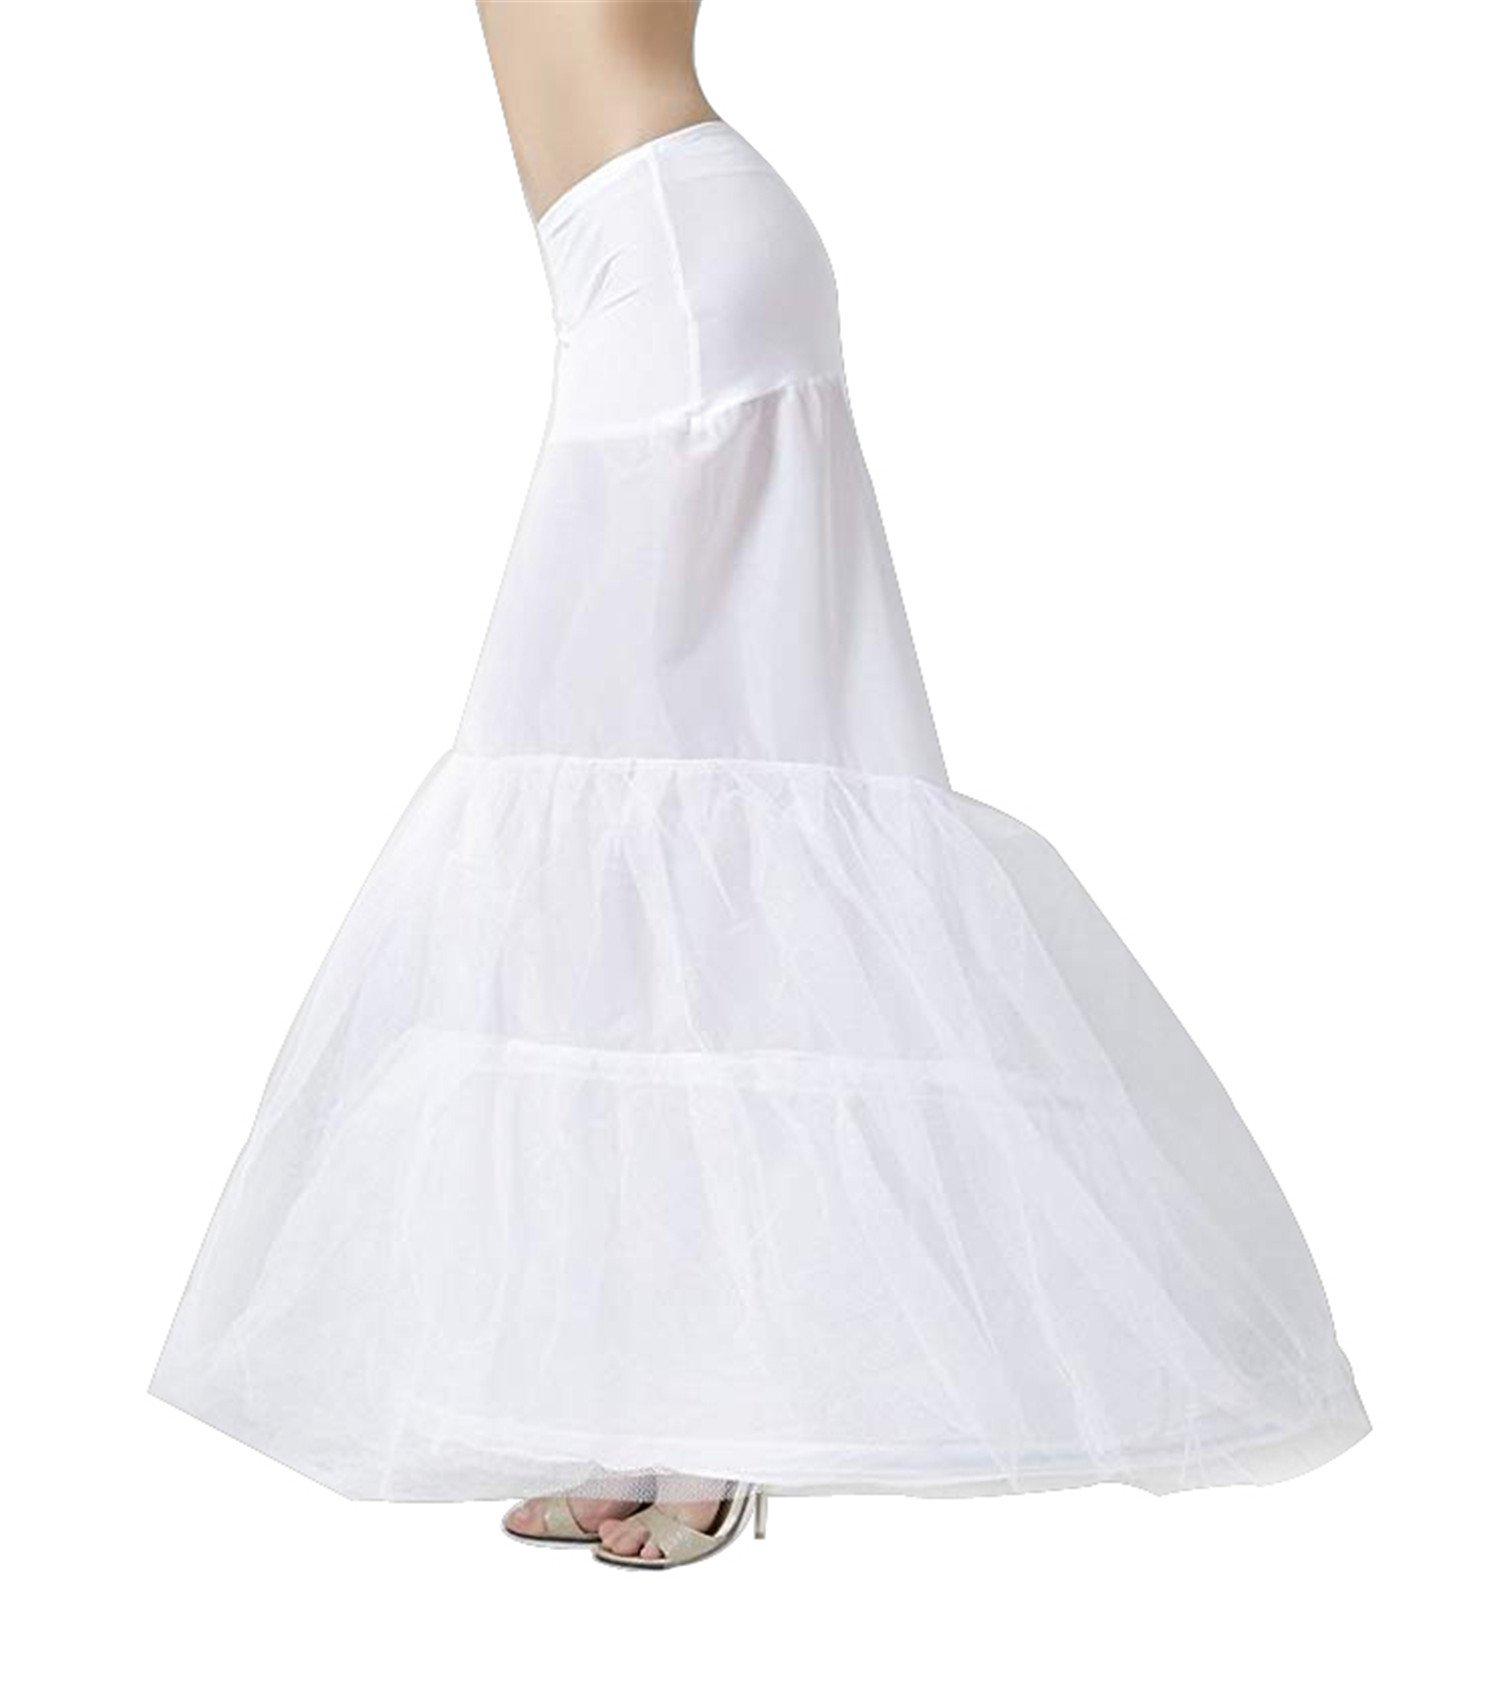 YULUOSHA Women Trumpet Mermaid Fishtail Petticoat Crinoline Underskirt Slips Floor Length for Wedding Dress Ballgown (Waist:66-90cm)